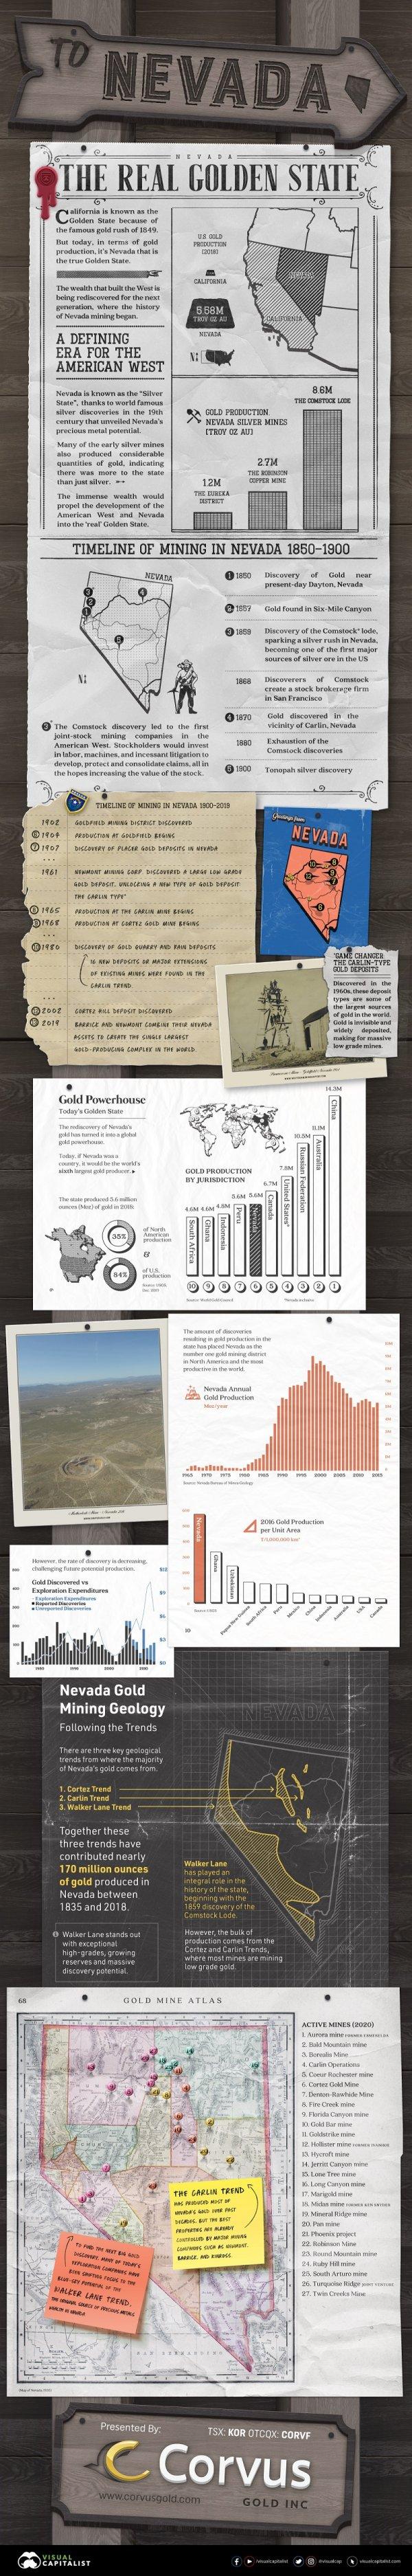 corvus nevadamininghistory infographic 14